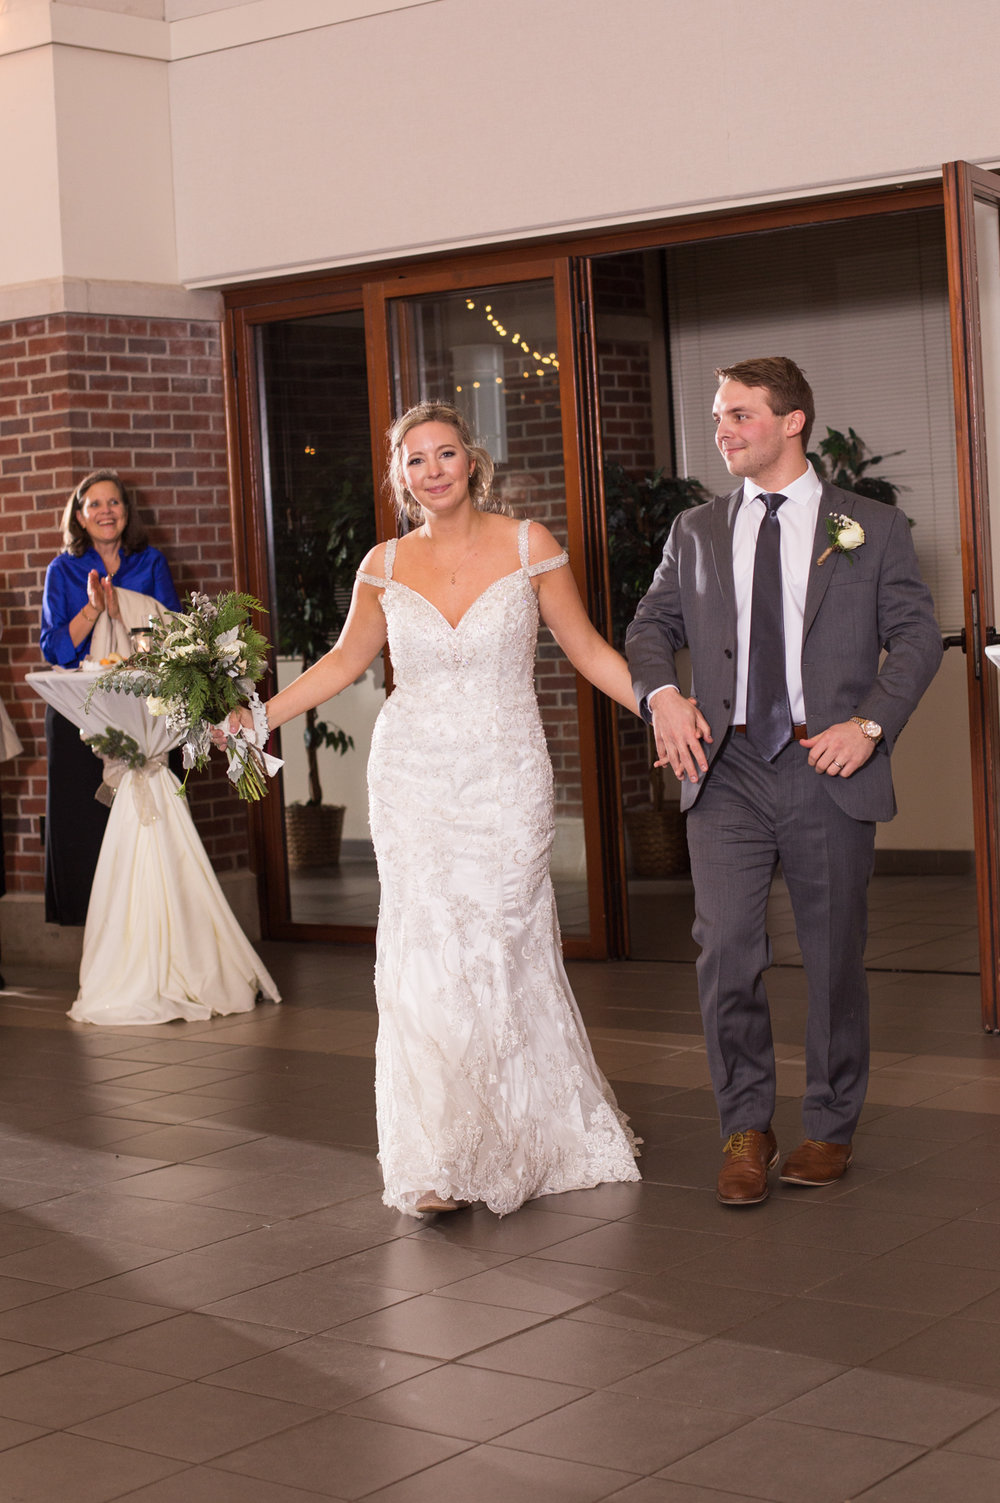 Kelli-and-Matt-Nashville-Wedding-Sneak-Peak-0266.jpg